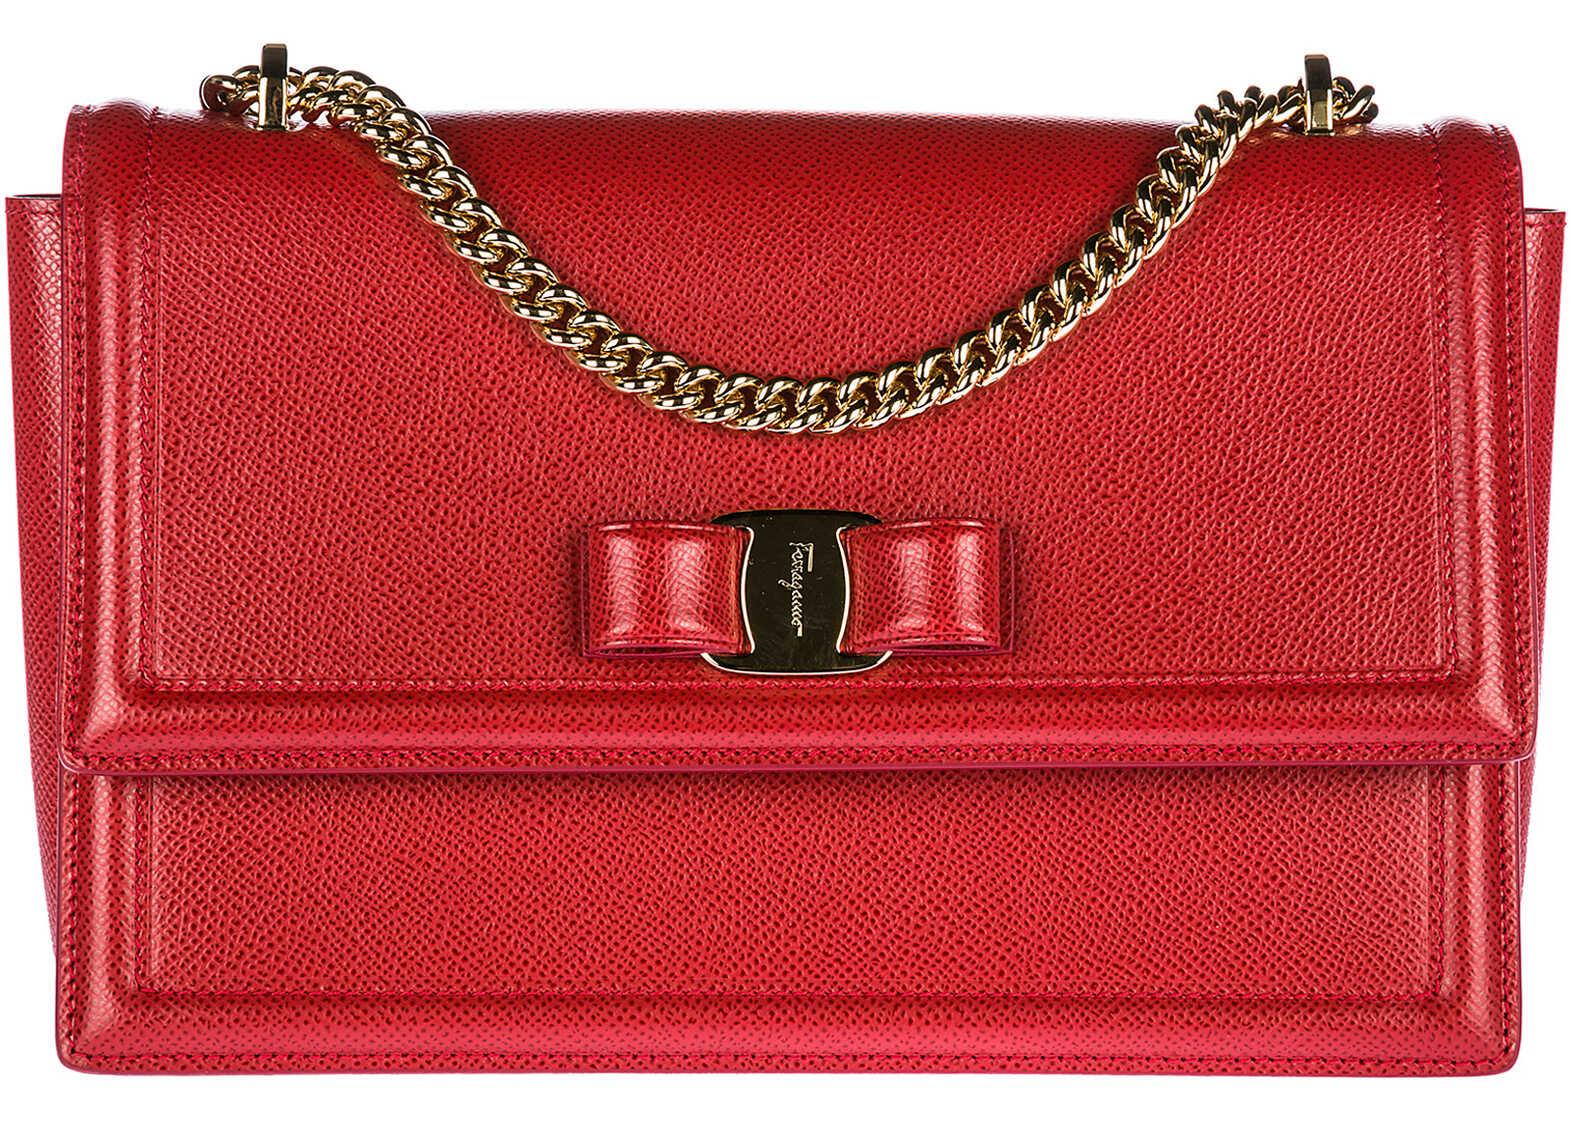 Salvatore Ferragamo Bag Ginny Red